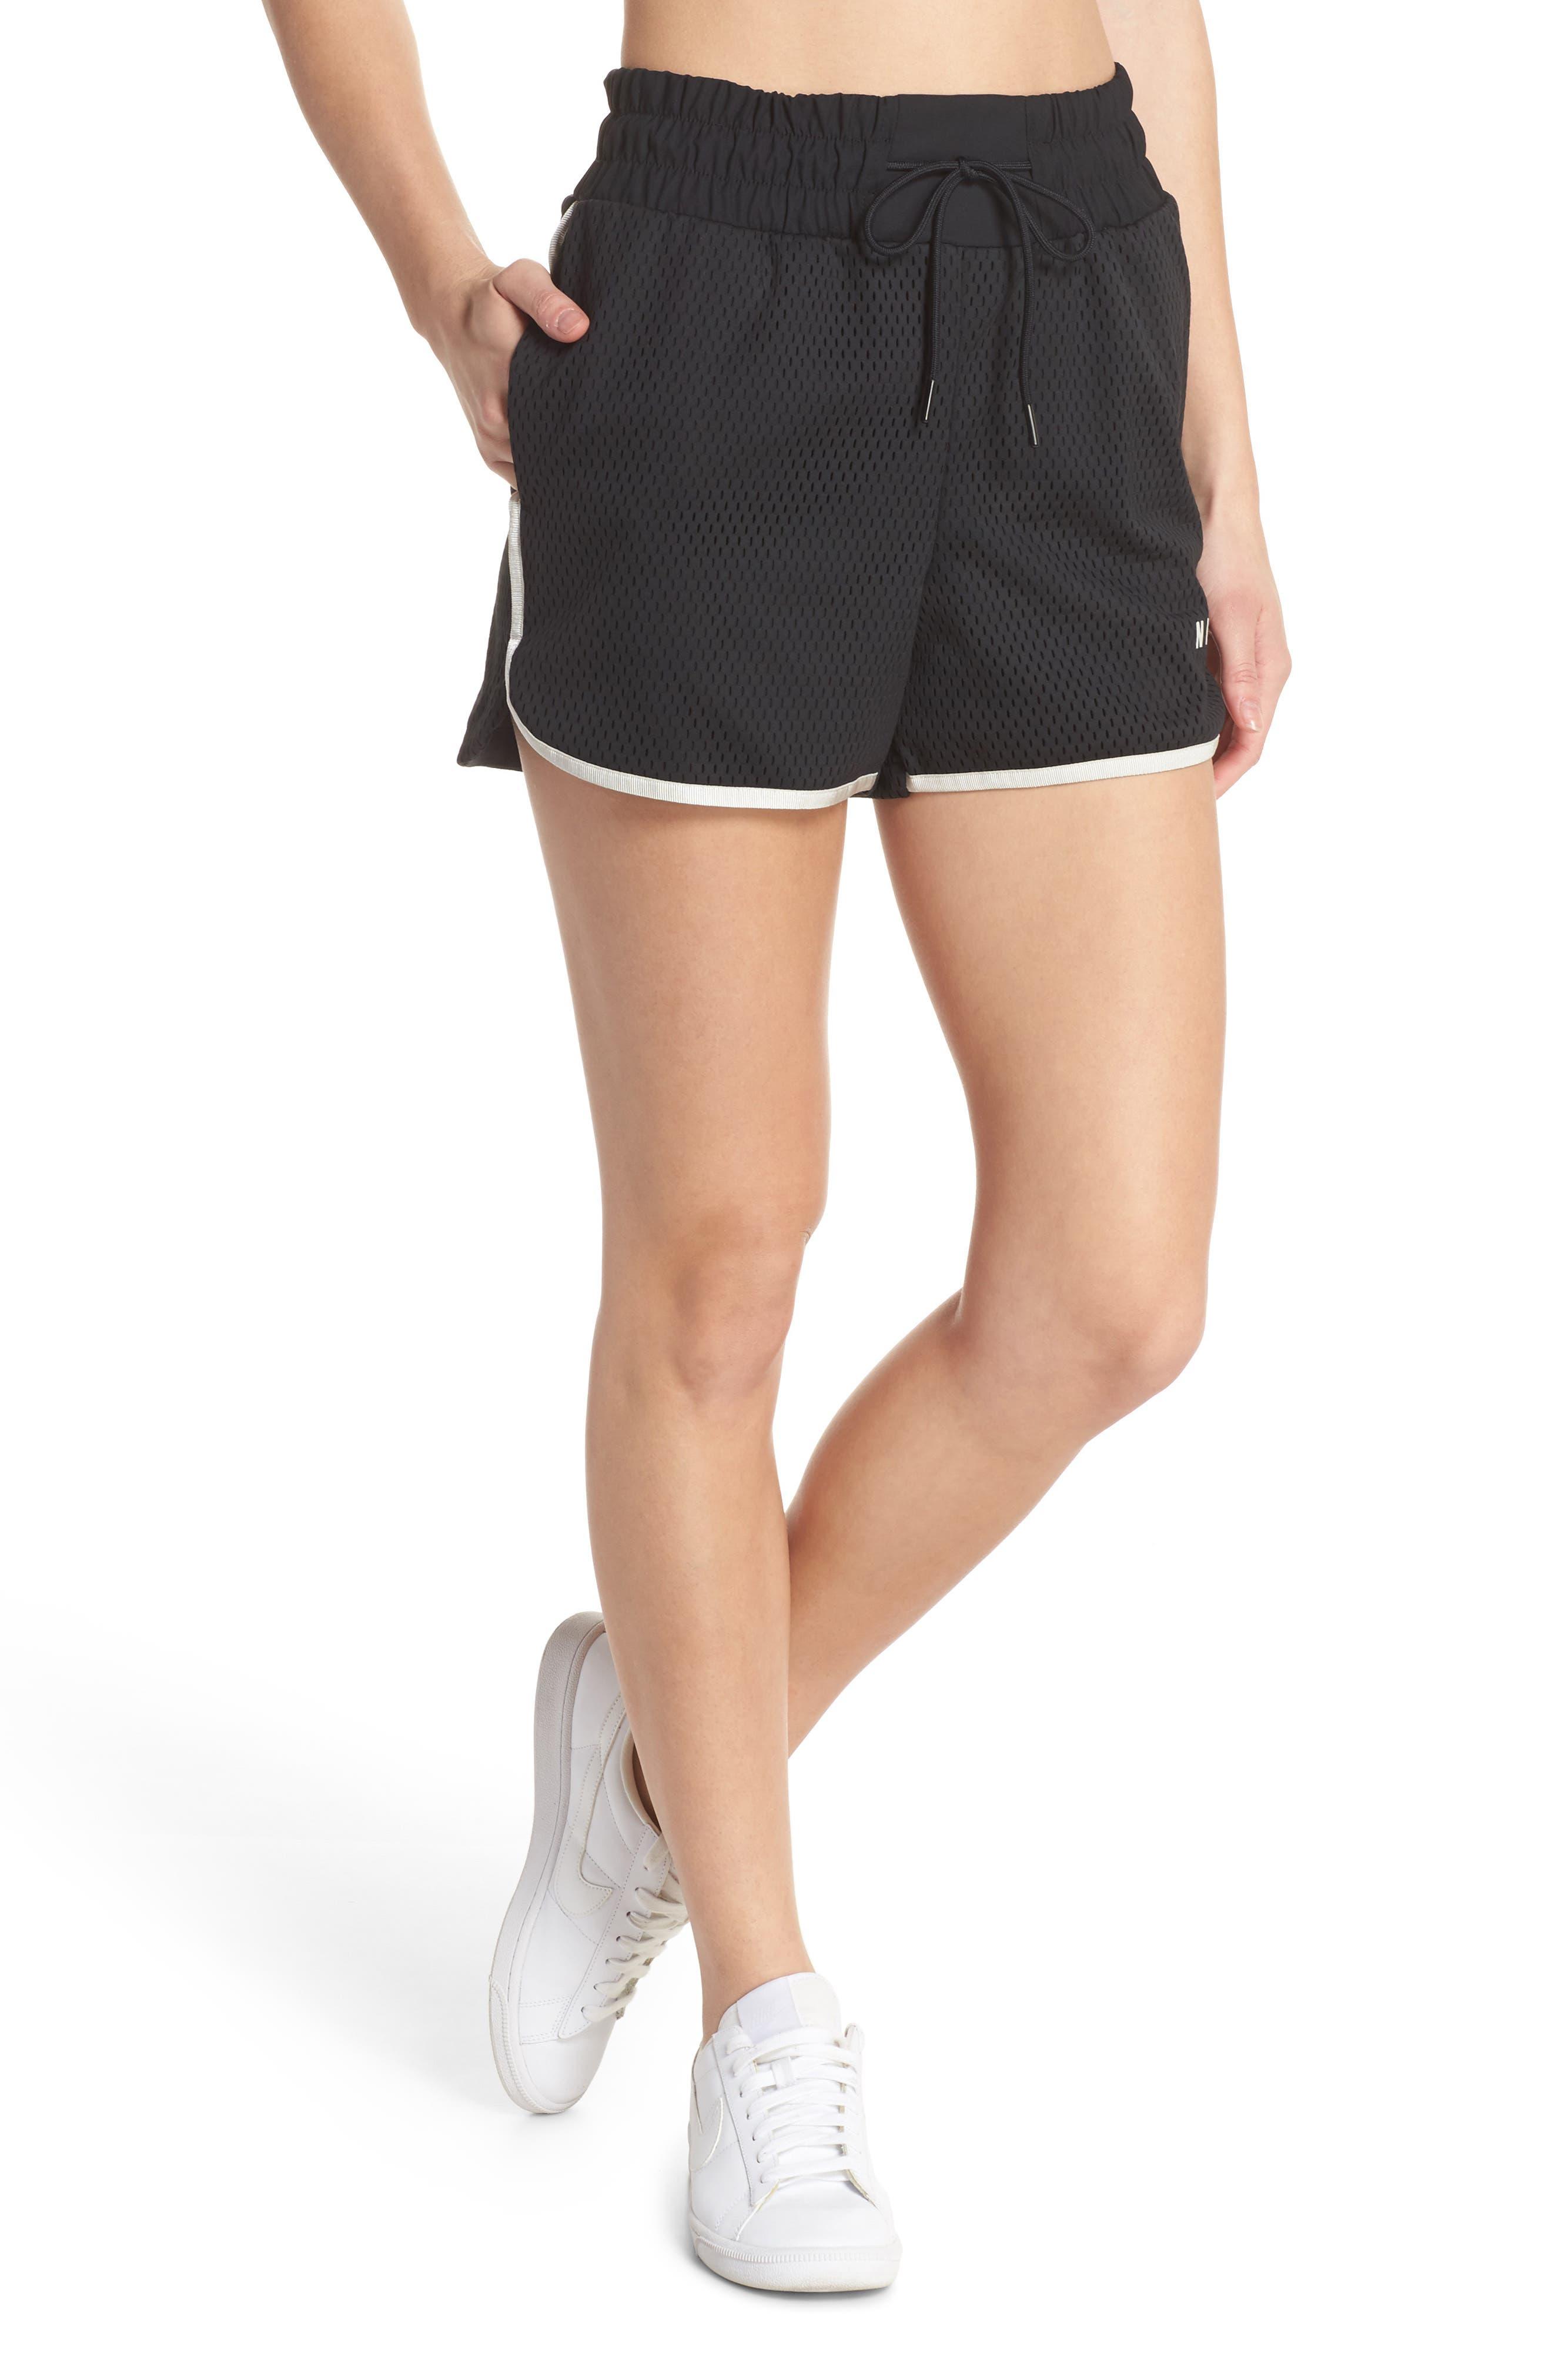 Sportswear Women's Dri-FIT Mesh Shorts,                         Main,                         color, BLACK/ LIGHT BONE